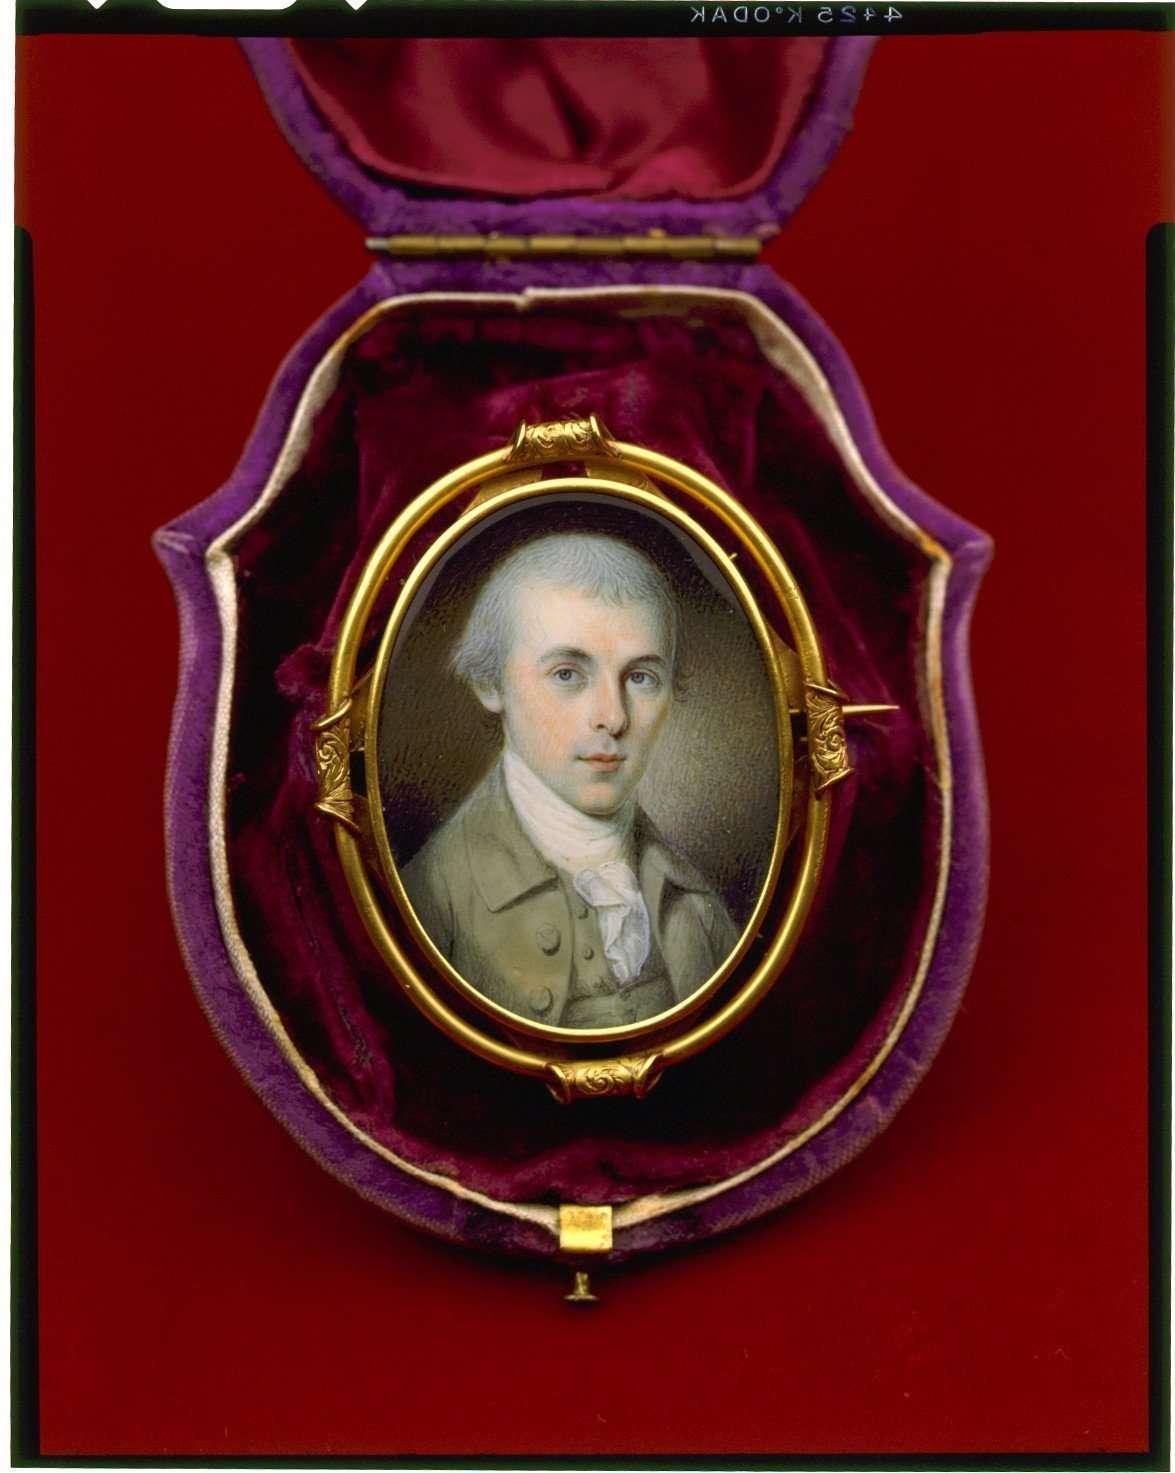 Miniature Portrait of James Madison